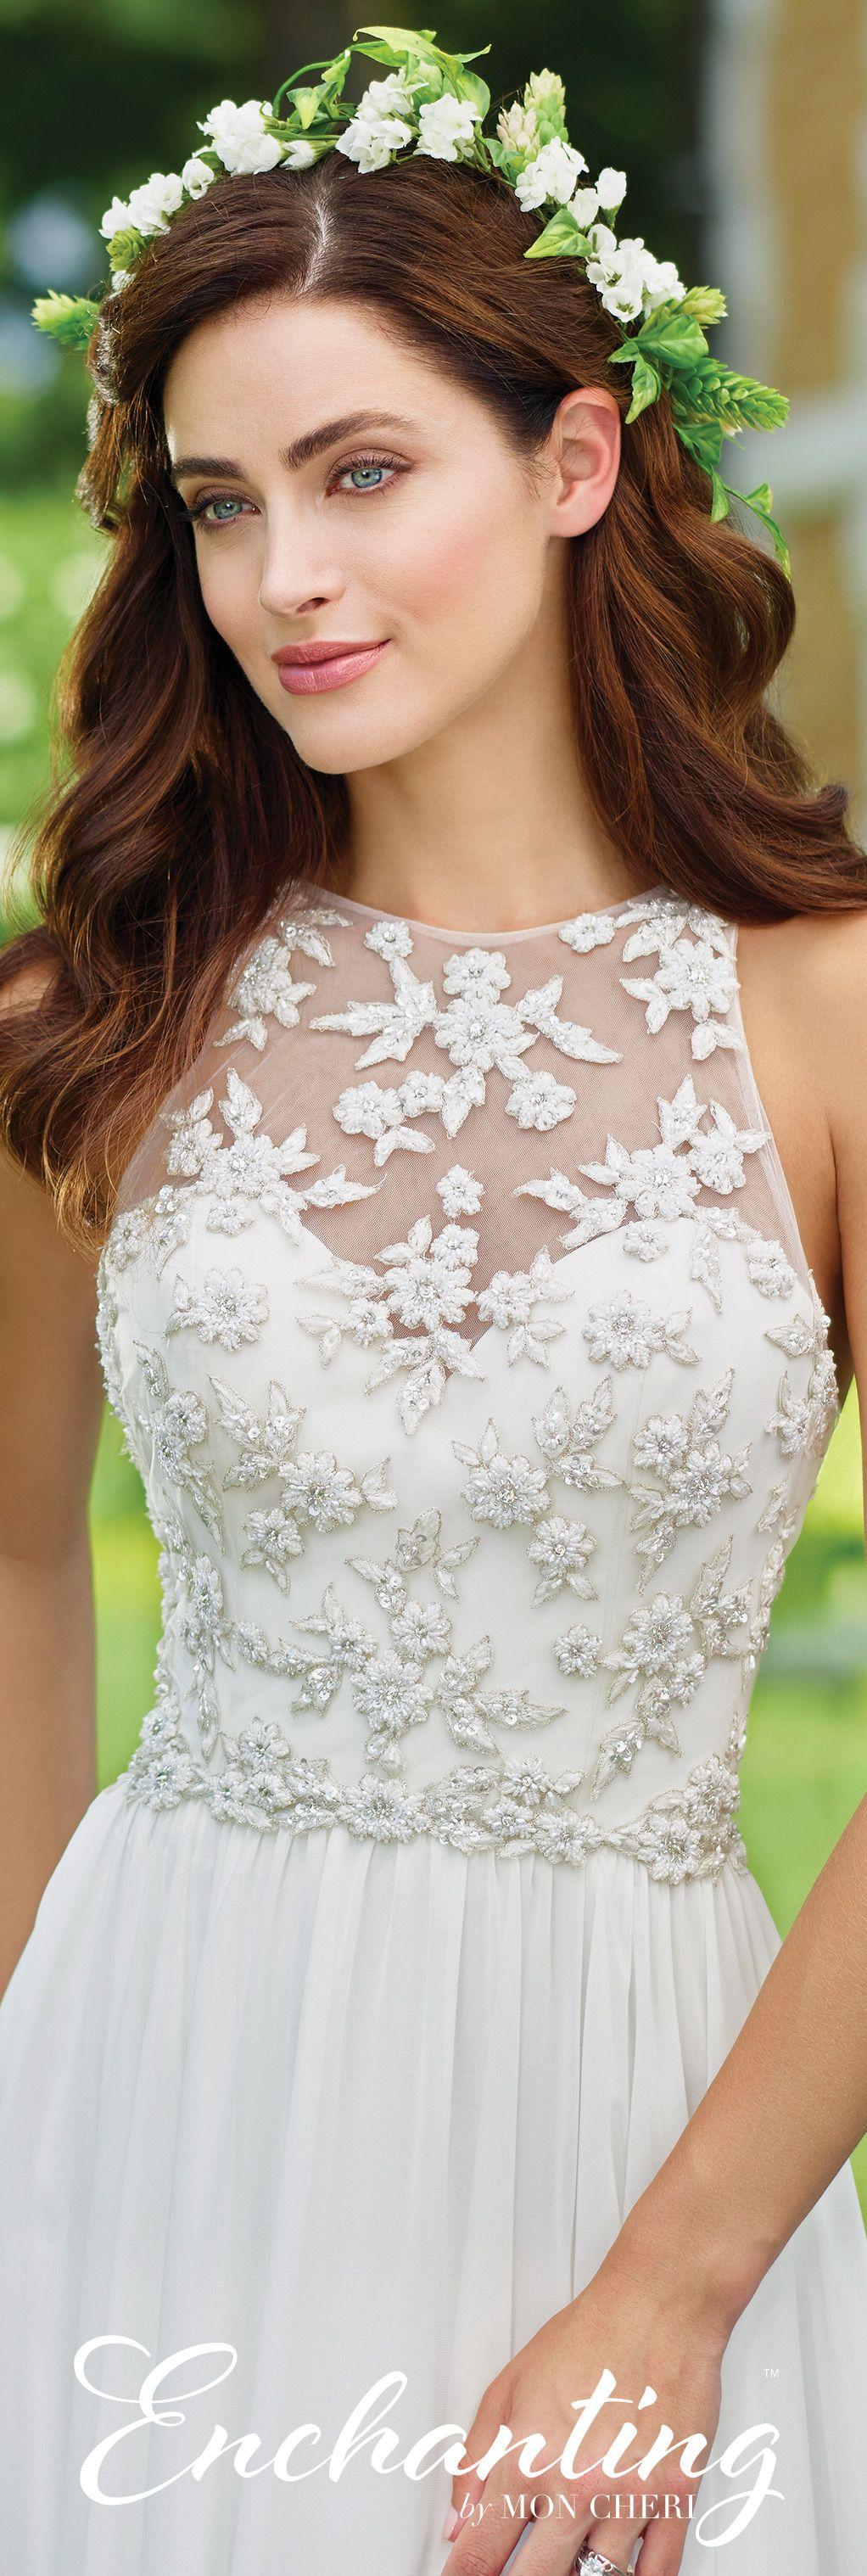 chiffon a-line wedding dress- 117174- enchantingmon cheri